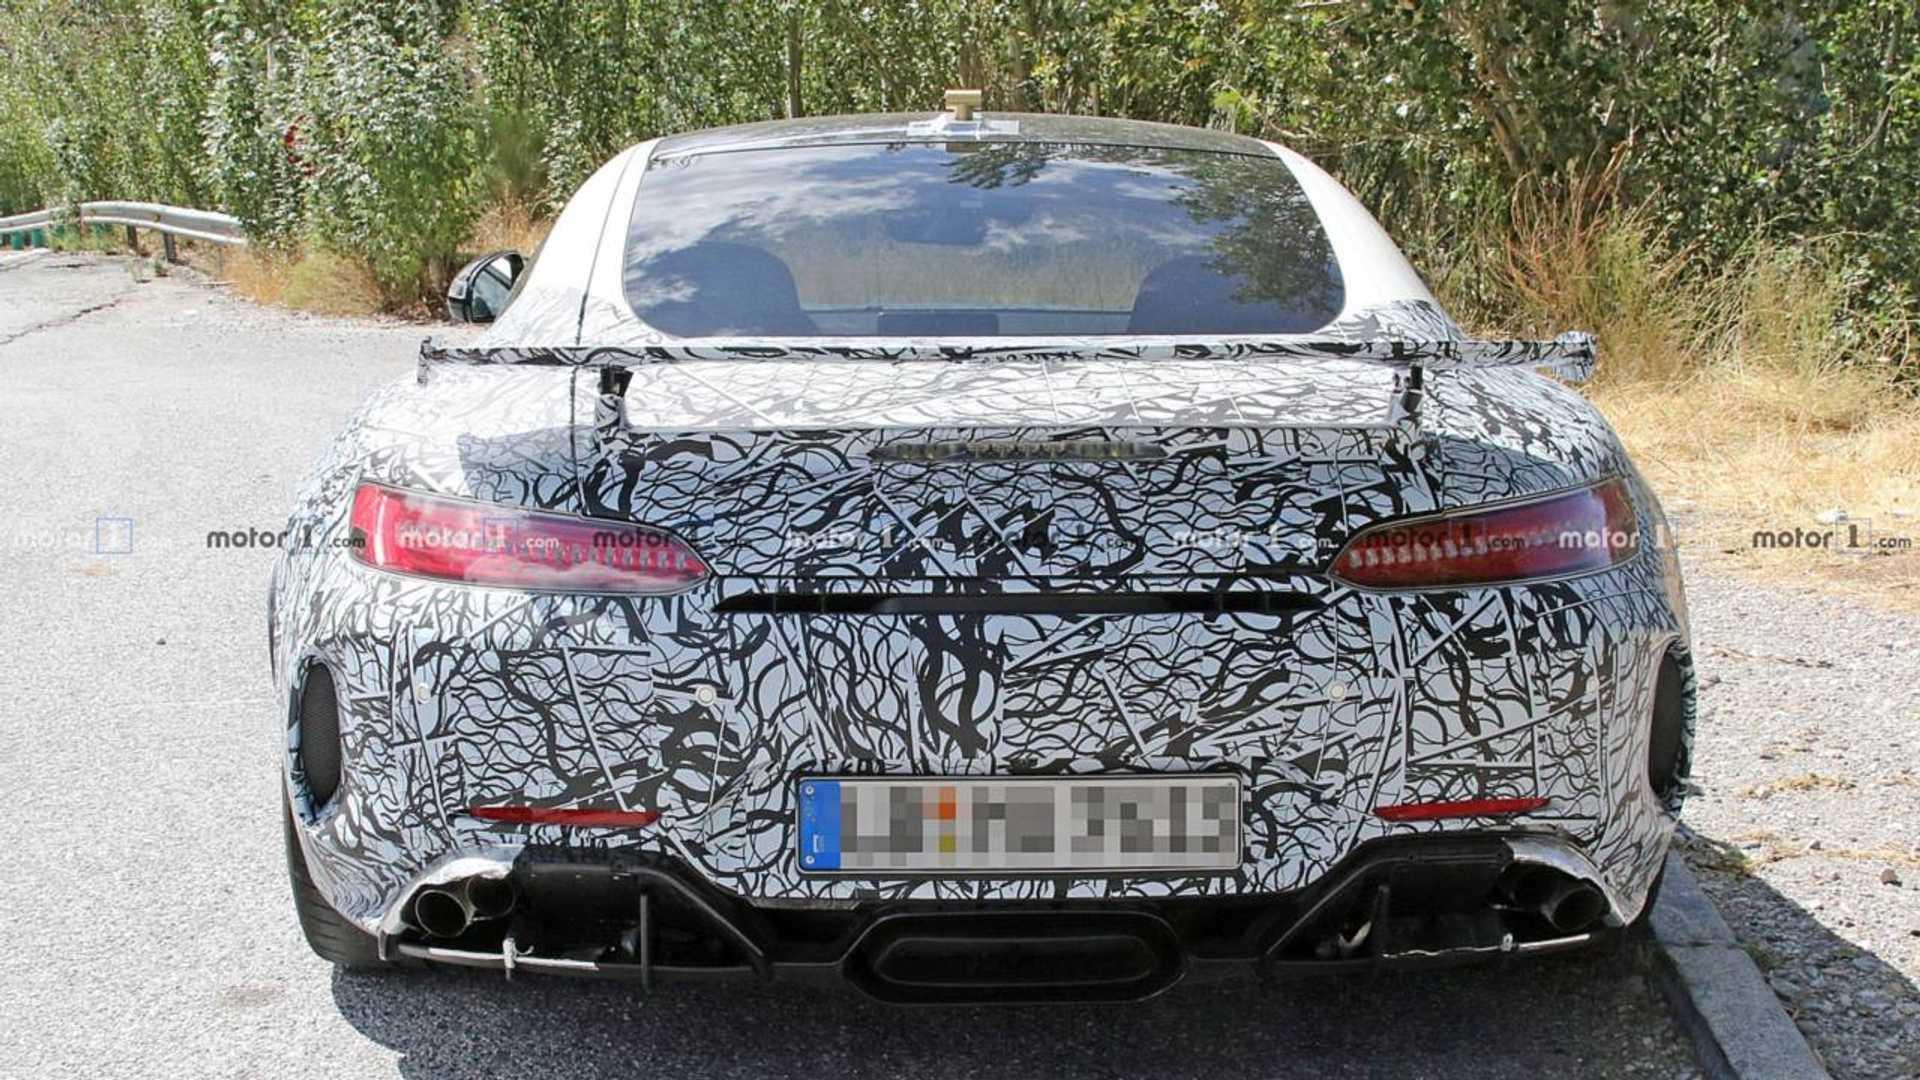 Mercedes-AMG GT R Spied With Lexus-Esque Exhaust